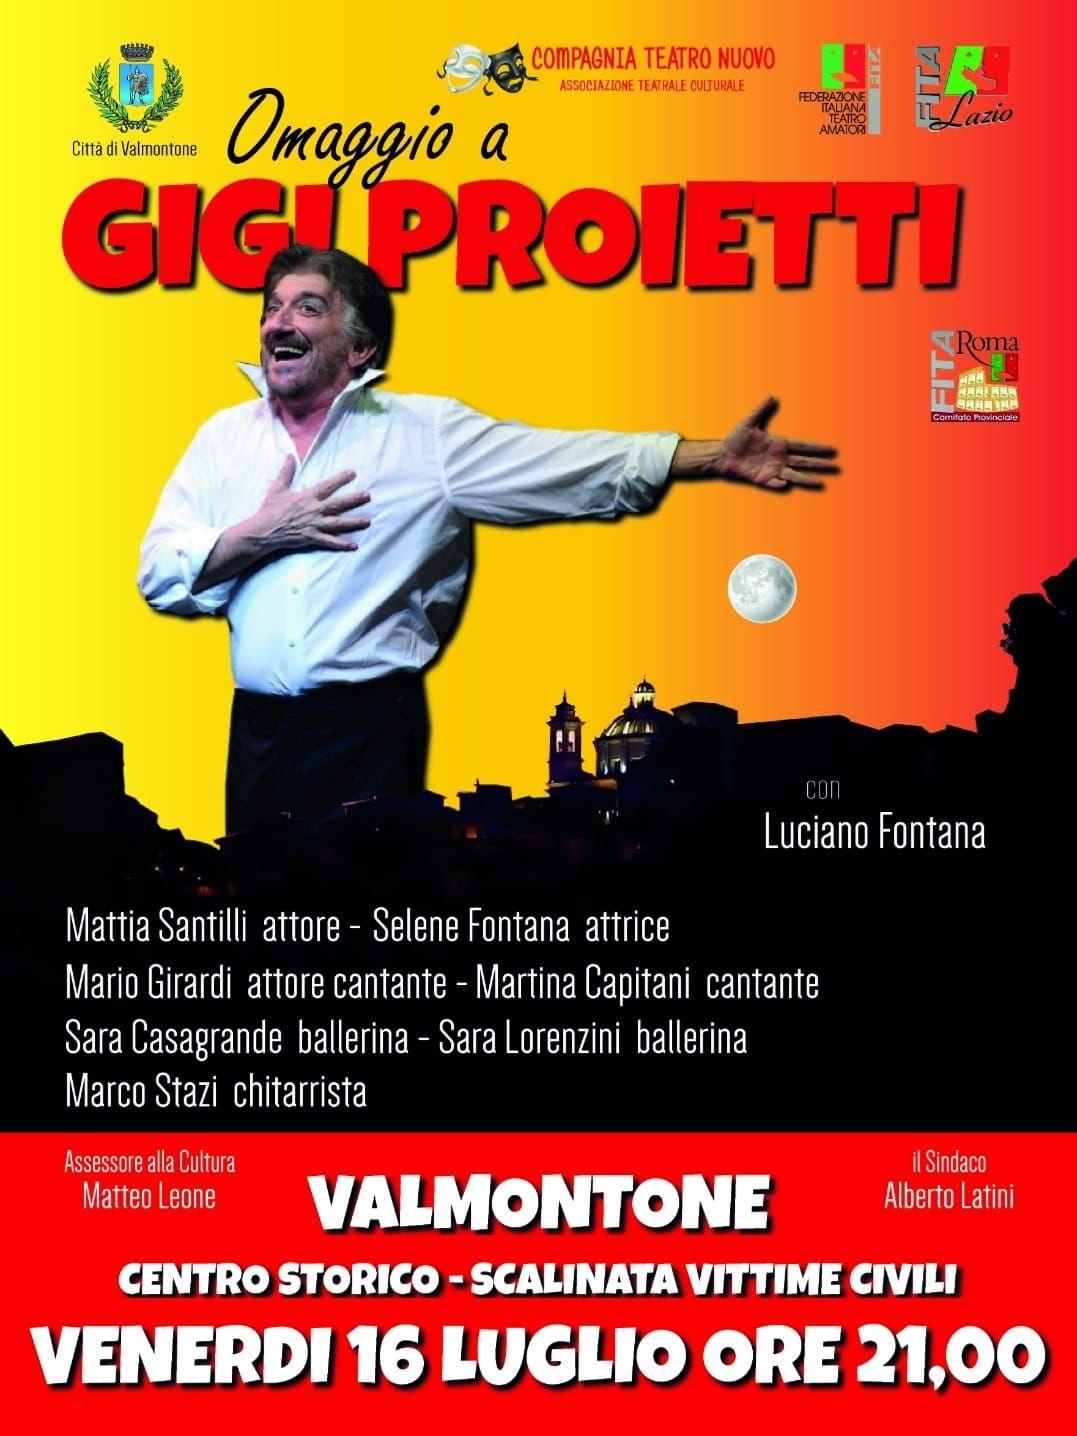 Teatro e musica a Valmontone